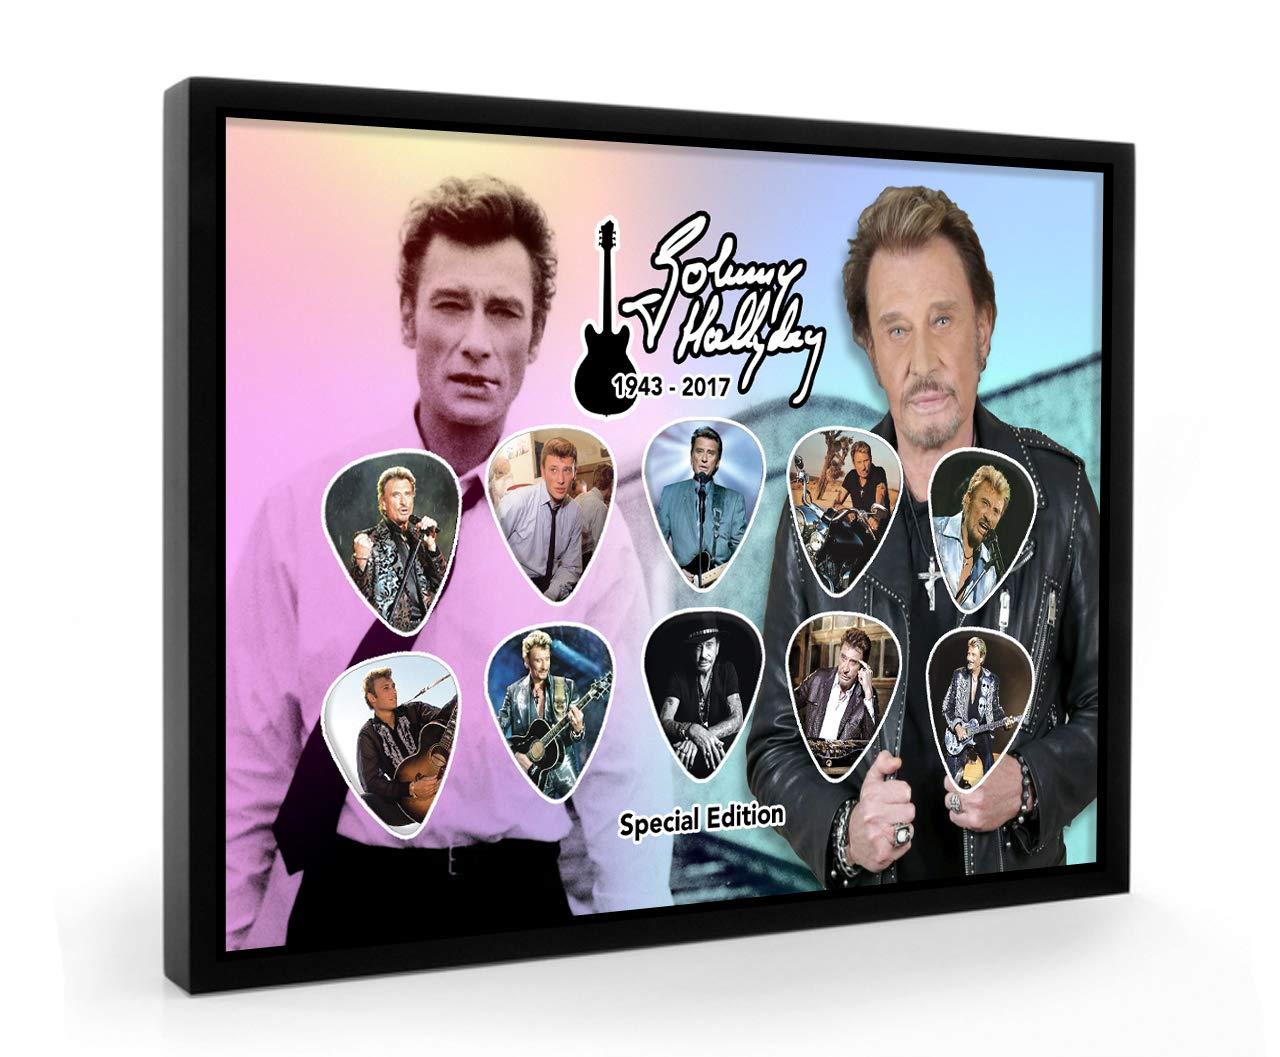 Johnny Hallyday Guitare encadré e Pick plectre Framed Display We Love Guitars